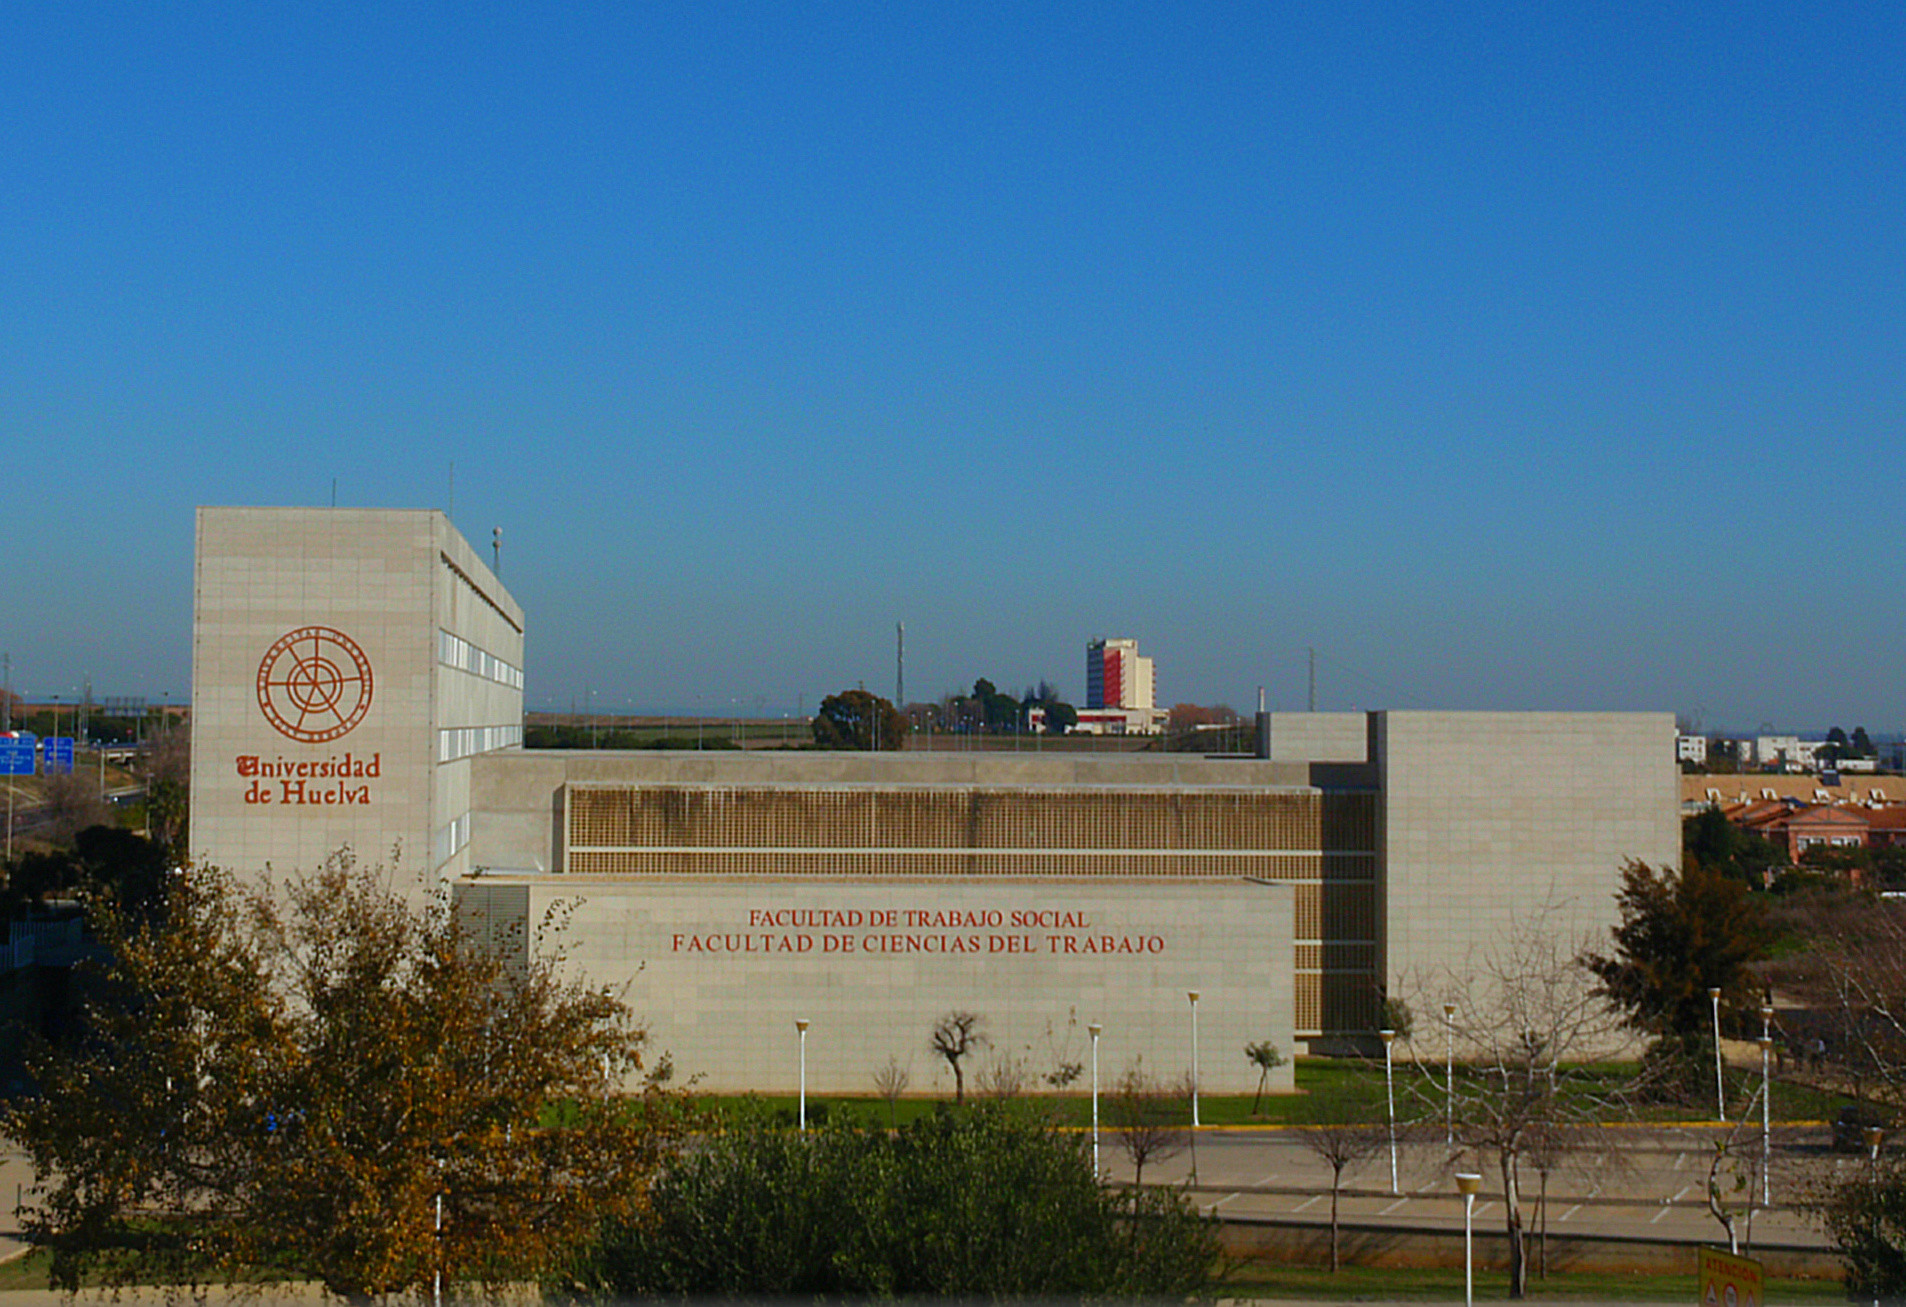 Esperienza all'Università di Huelva, Spagna di Marine